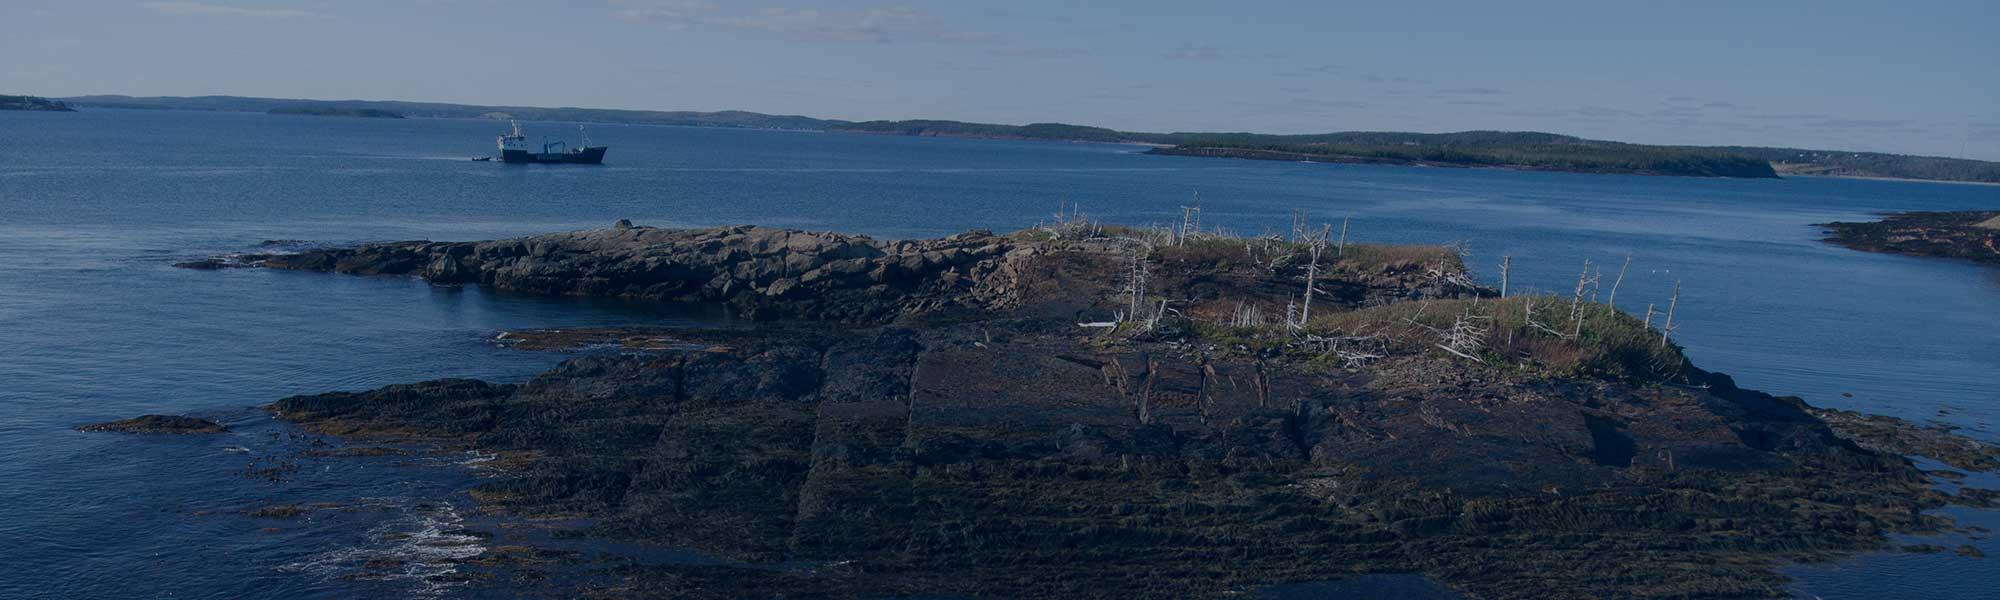 OCEARCH Tracks Return of 4 White Sharks to Nova Scotia